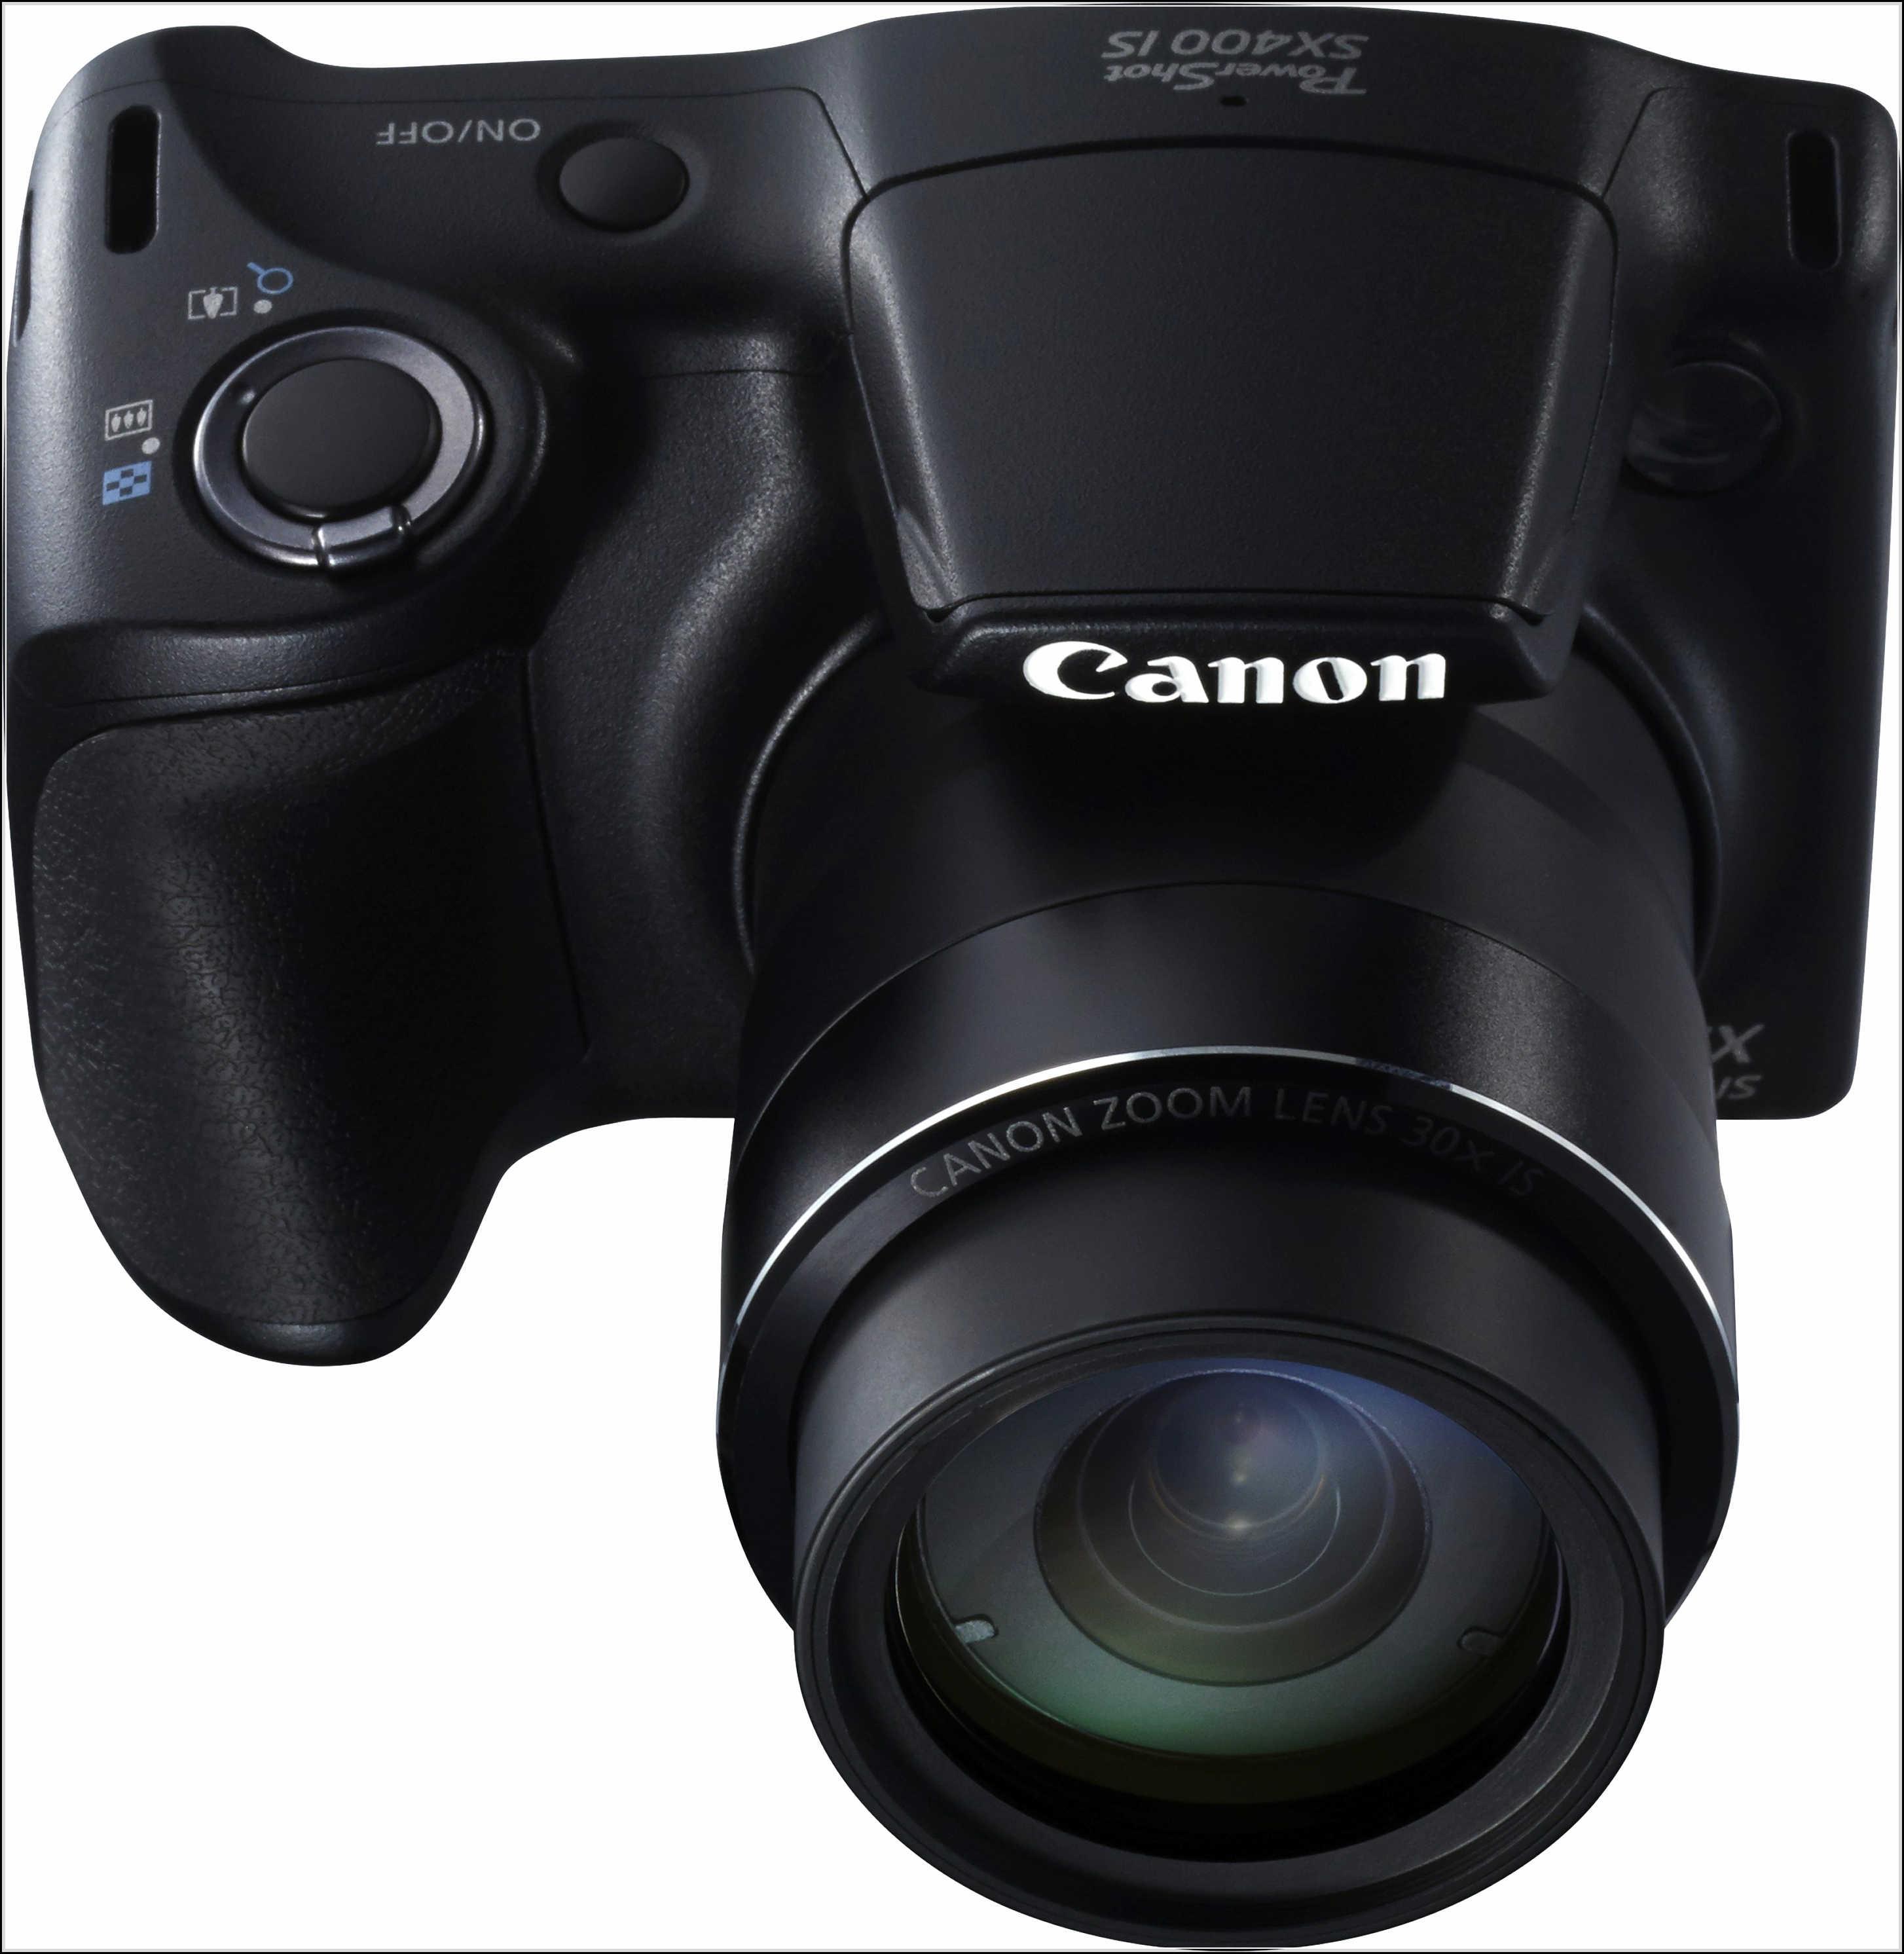 kamera digital canon terbaik